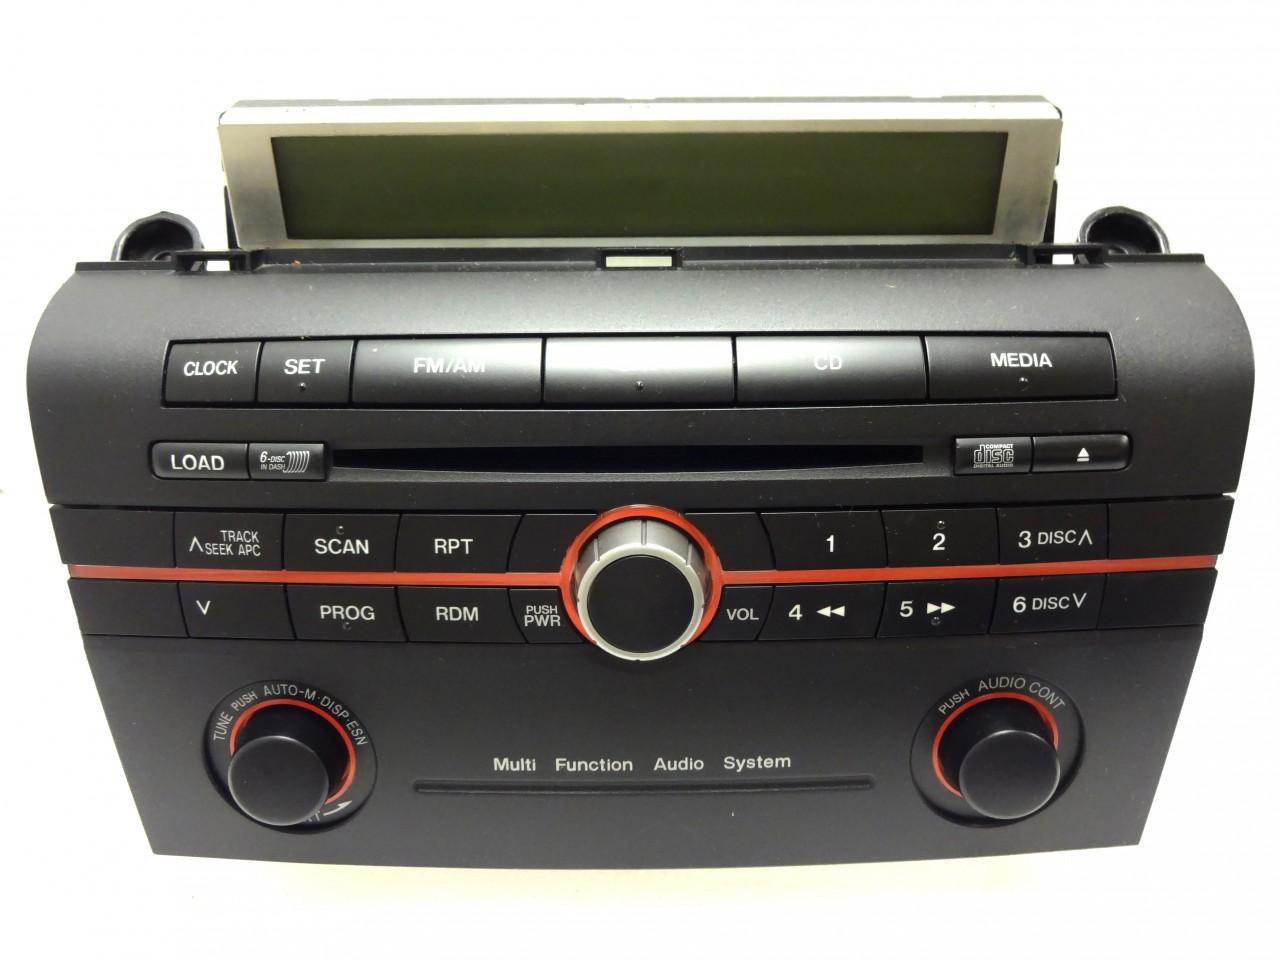 06 07 08 mazda 3 radio stereo 6 disc changer cd player. Black Bedroom Furniture Sets. Home Design Ideas